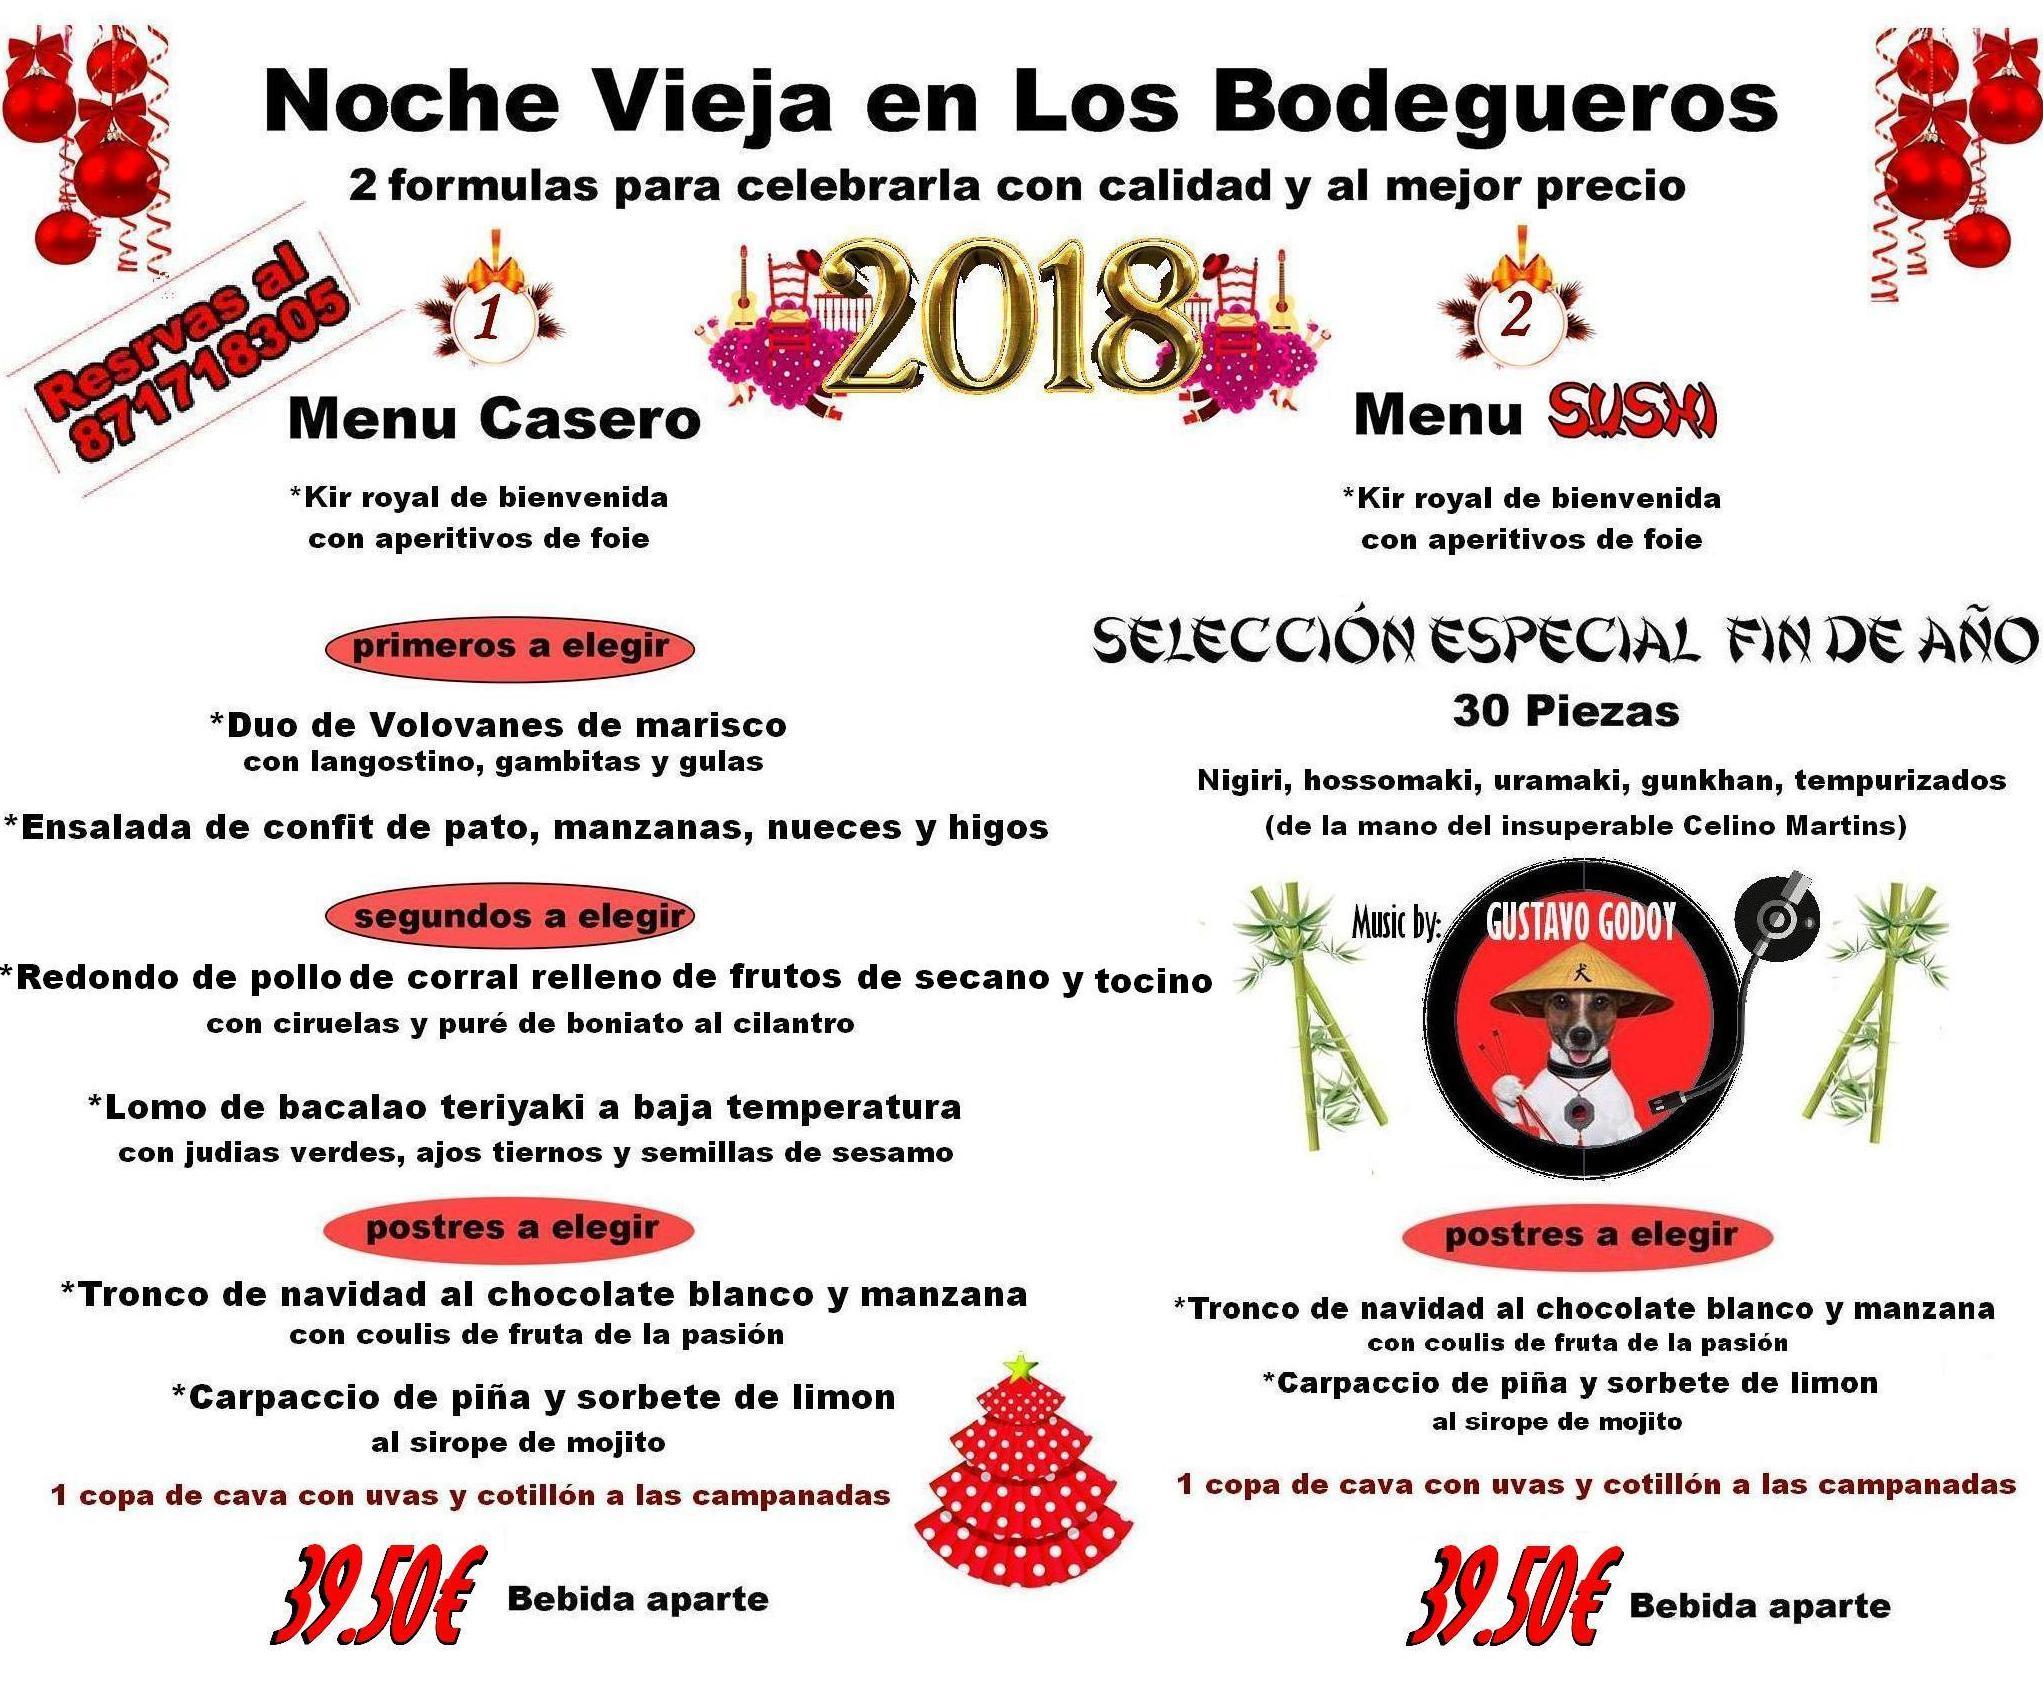 Menu de Noche vieja 2017/2018